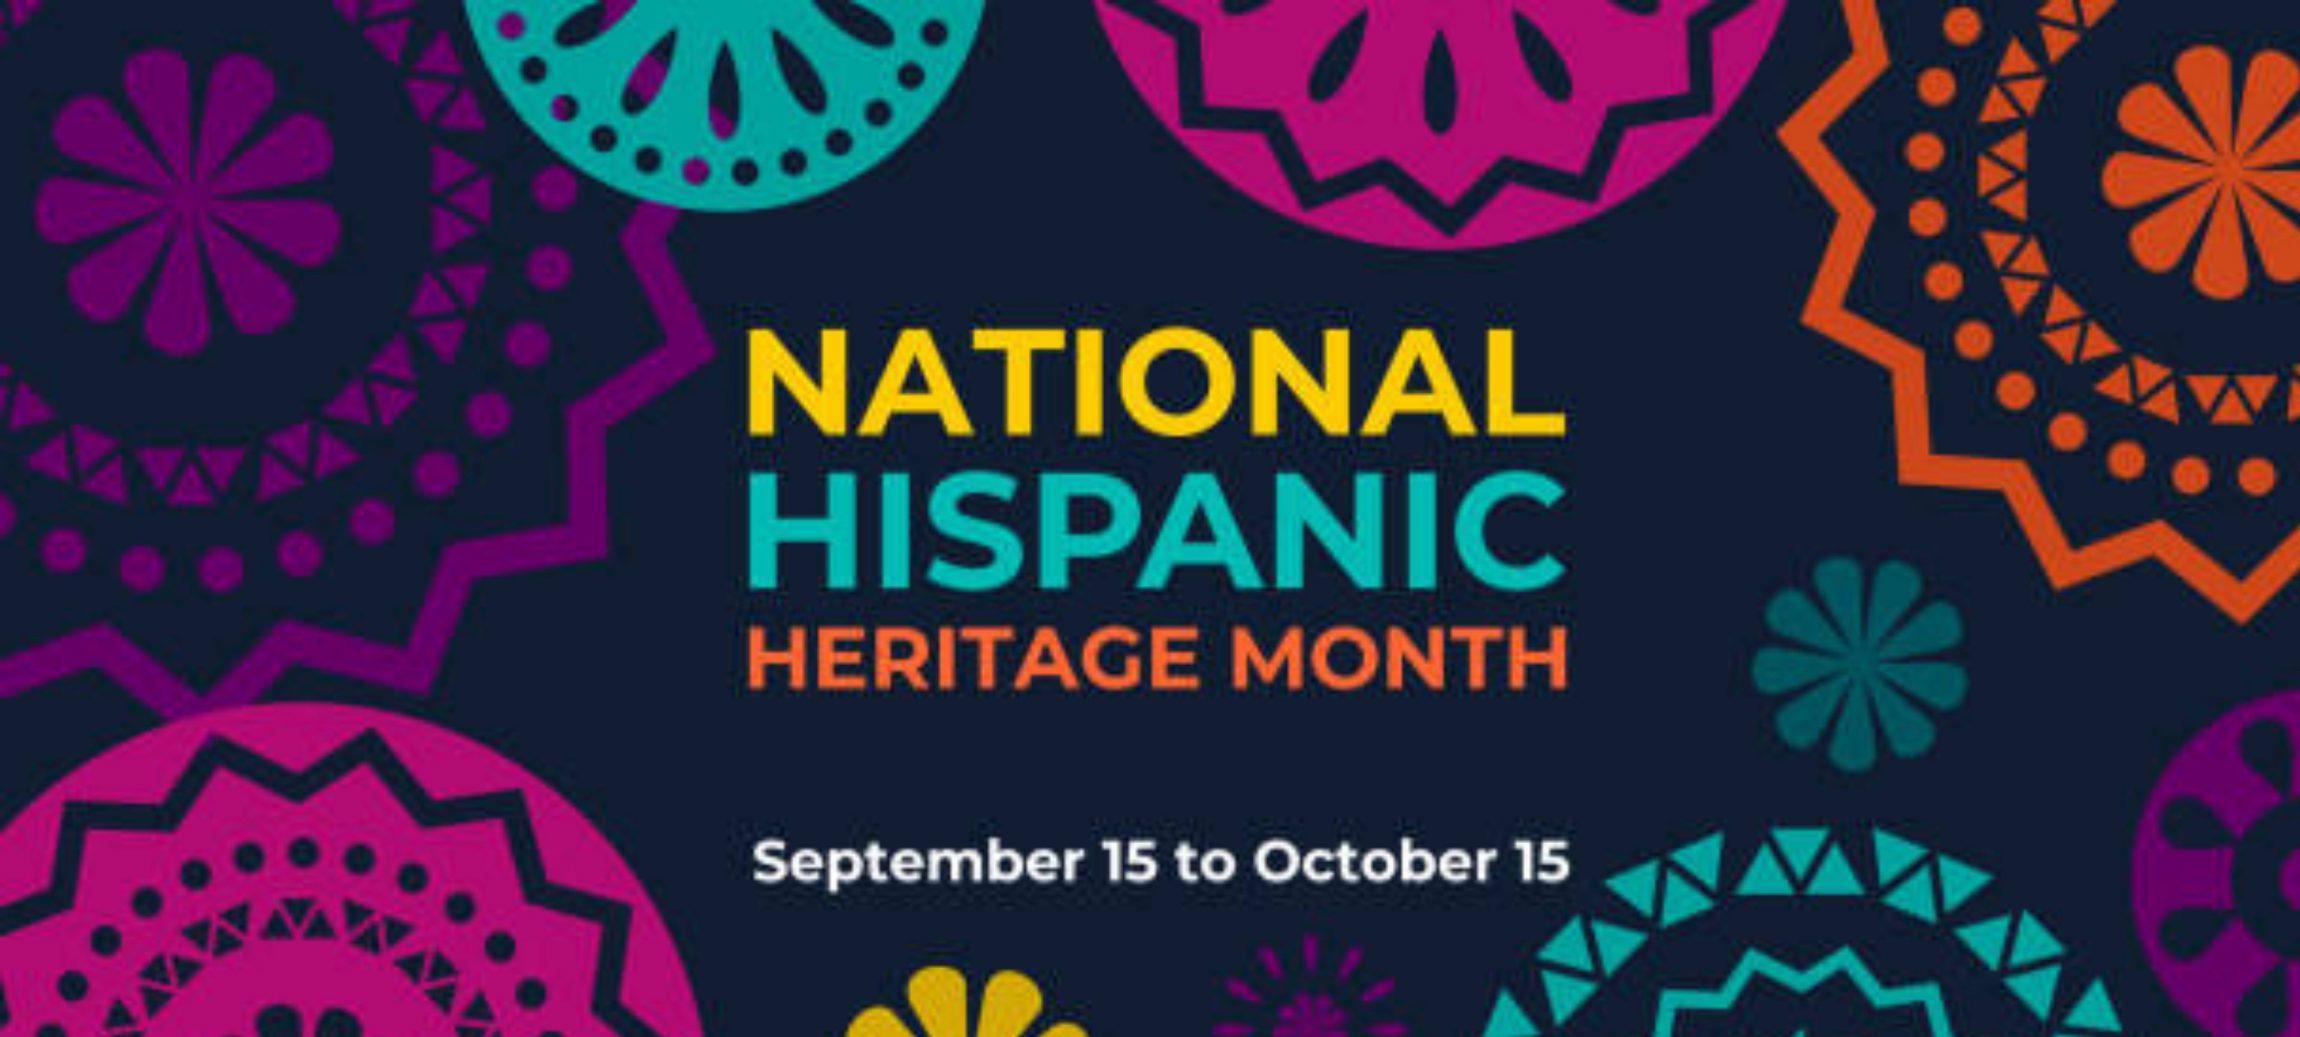 MECA&D Celebrates Hispanic Heritage Month (9/15-10/15) image